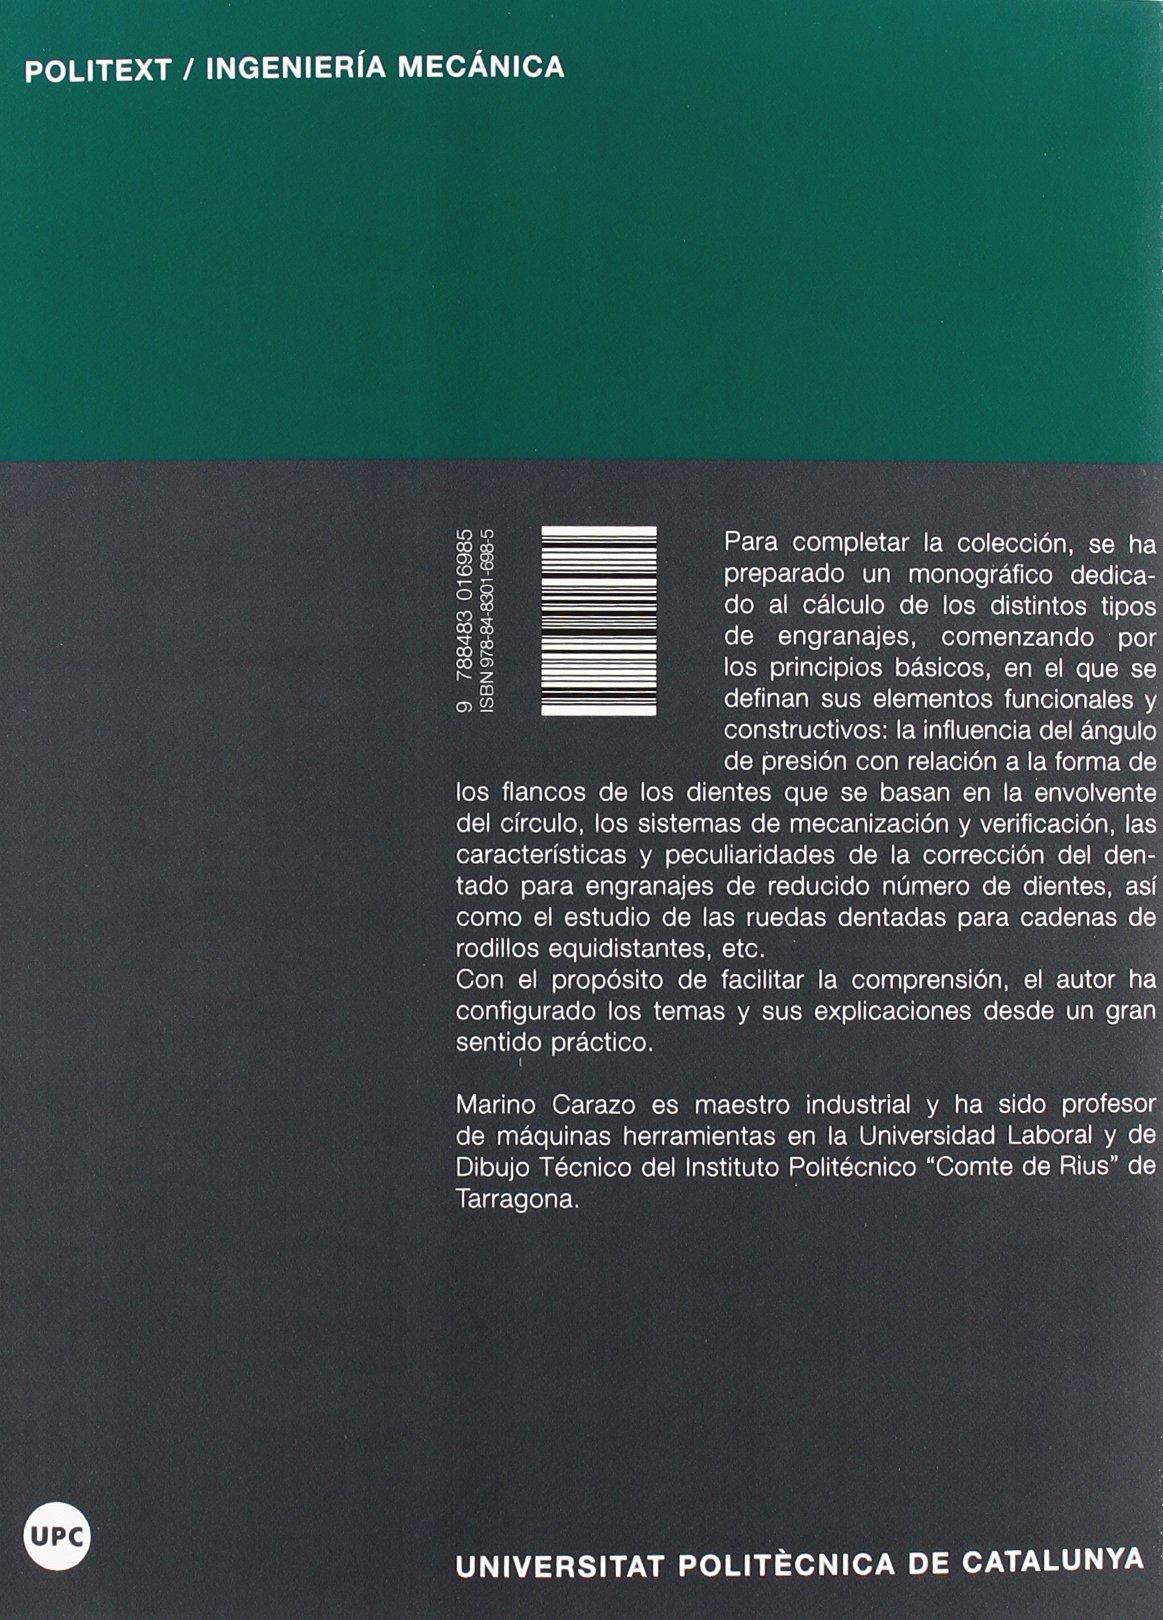 Apuntes de Taller. 3. Engra (Spanish Edition): Marino Carazo Lpez: 9788483016985: Amazon.com: Books